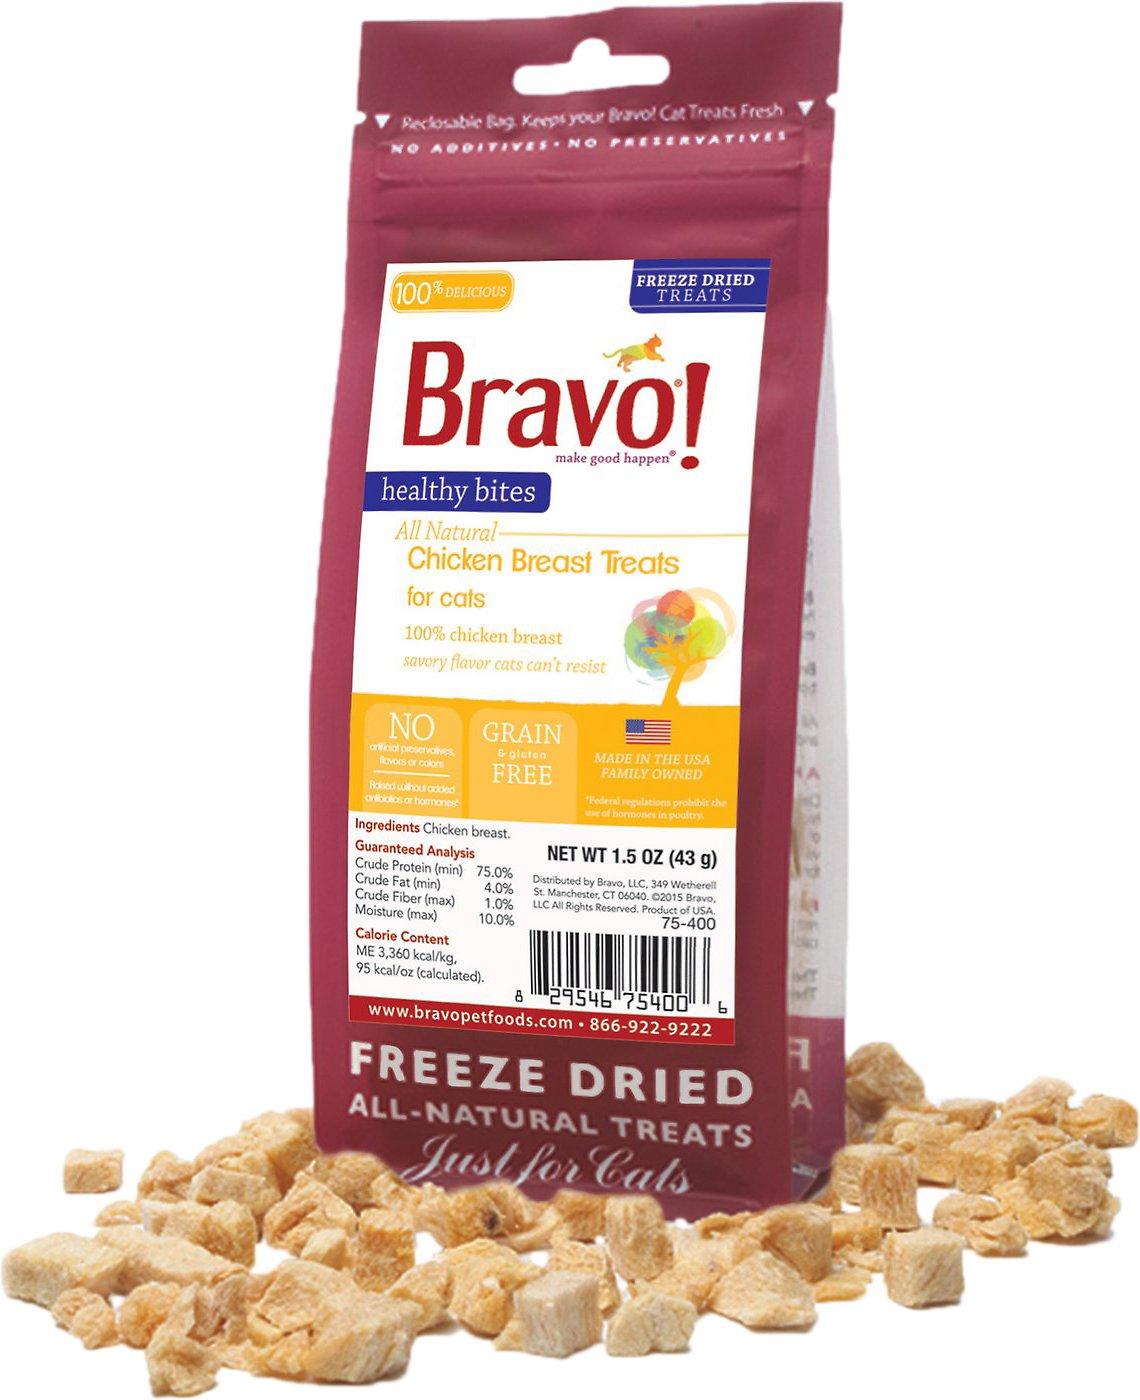 Bravo! Healthy Bites Chicken Breast Freeze-Dried Cat Treats, 1.5-oz bag